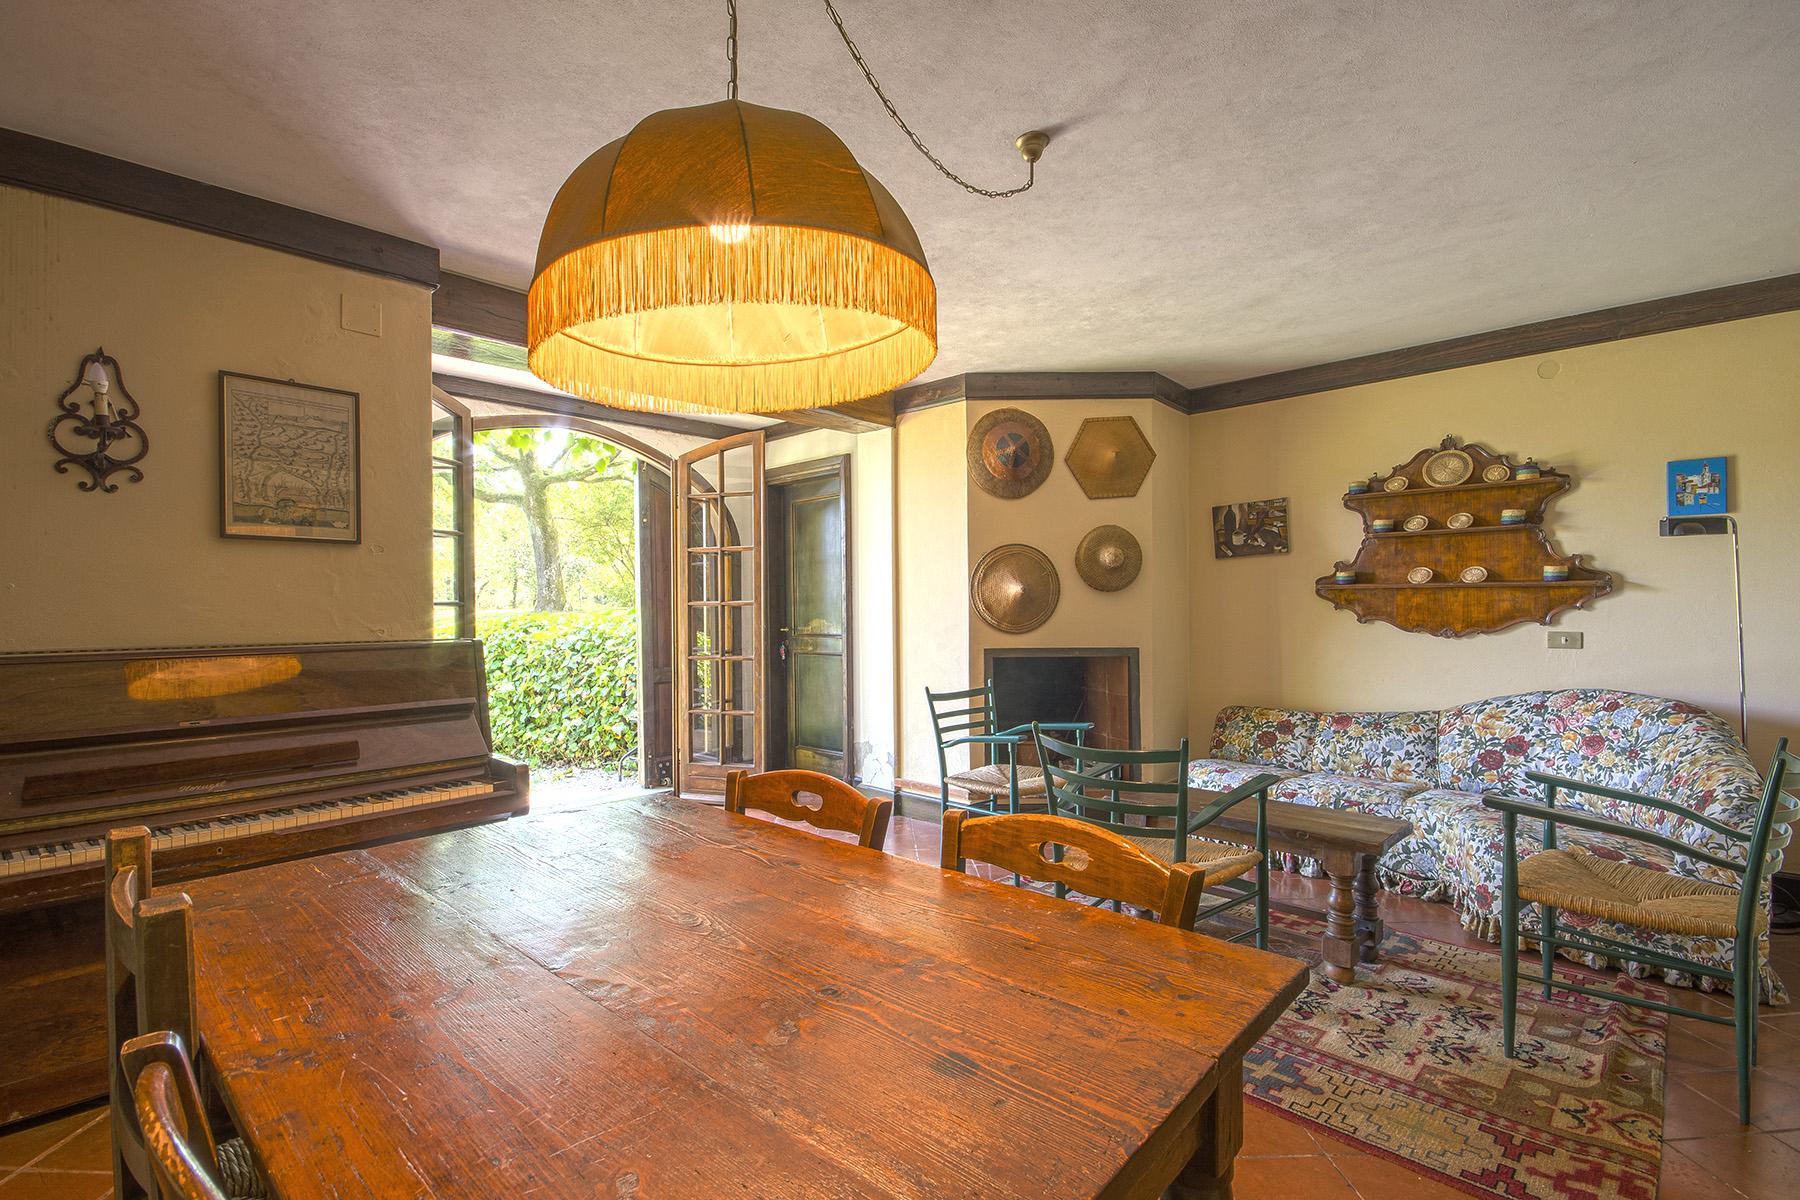 Villa in Vendita a Lucca: 5 locali, 600 mq - Foto 10